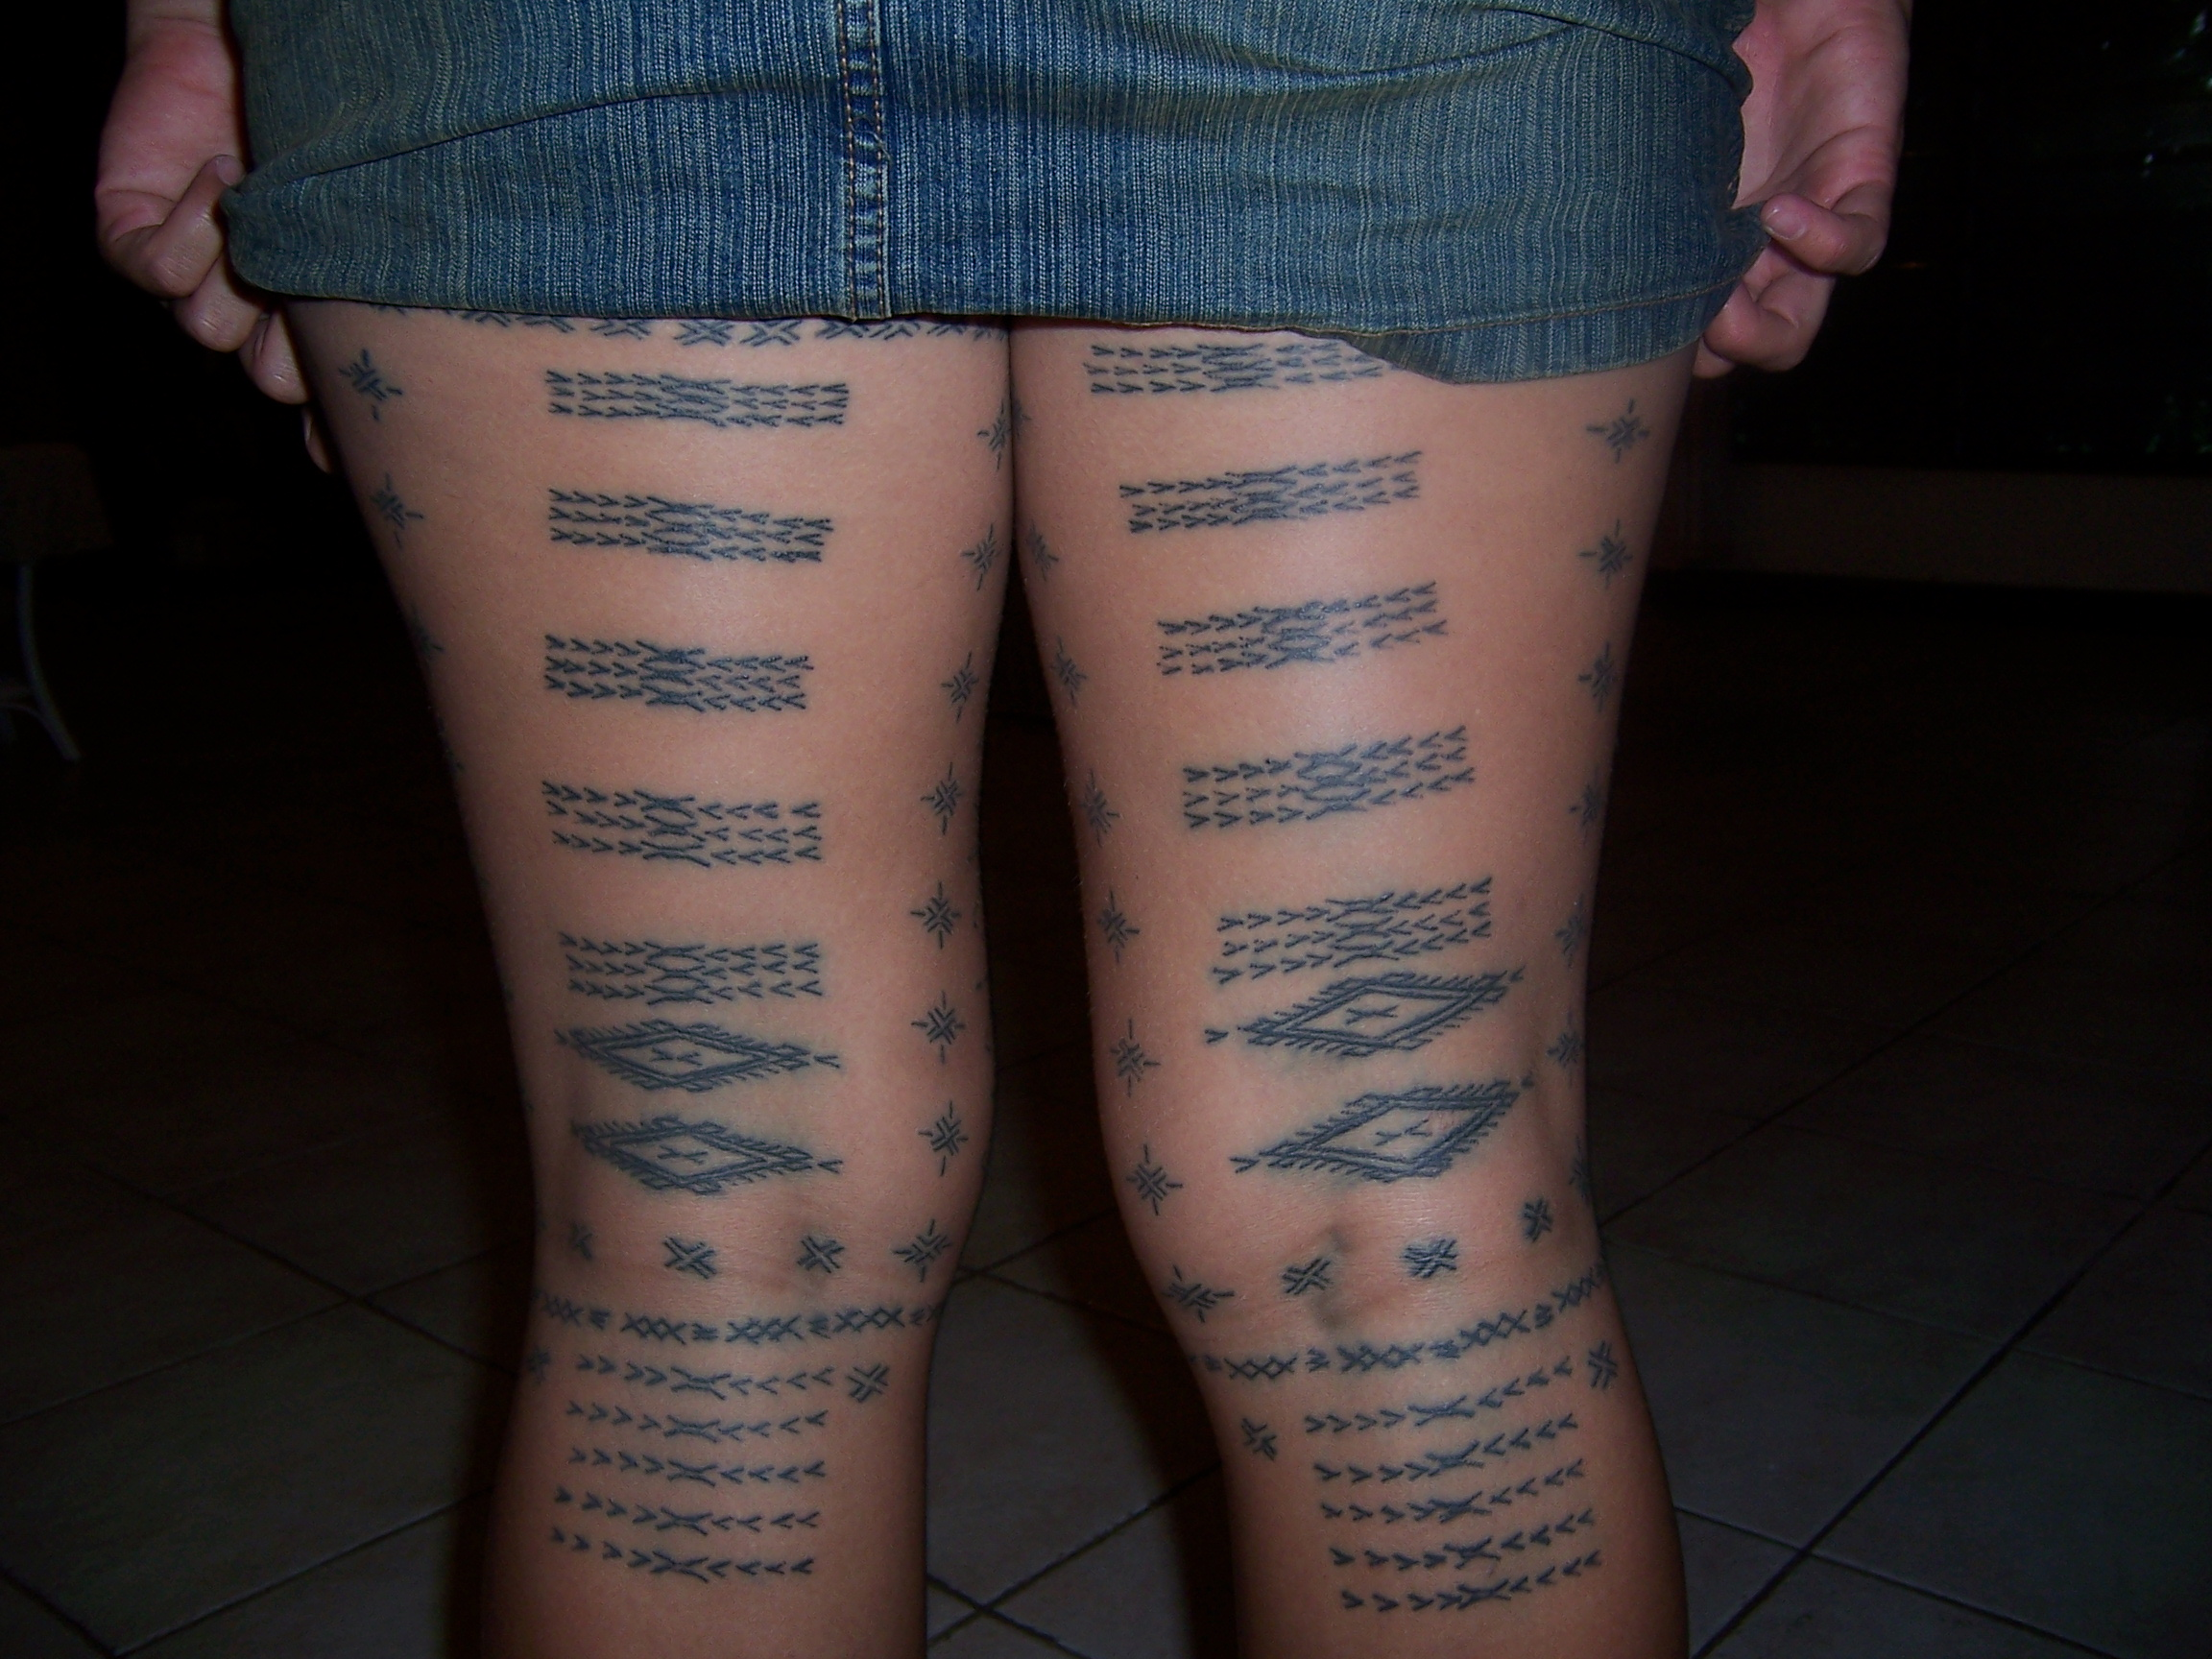 ... down upon by many people today samoan male tattoo samoan female tattoo